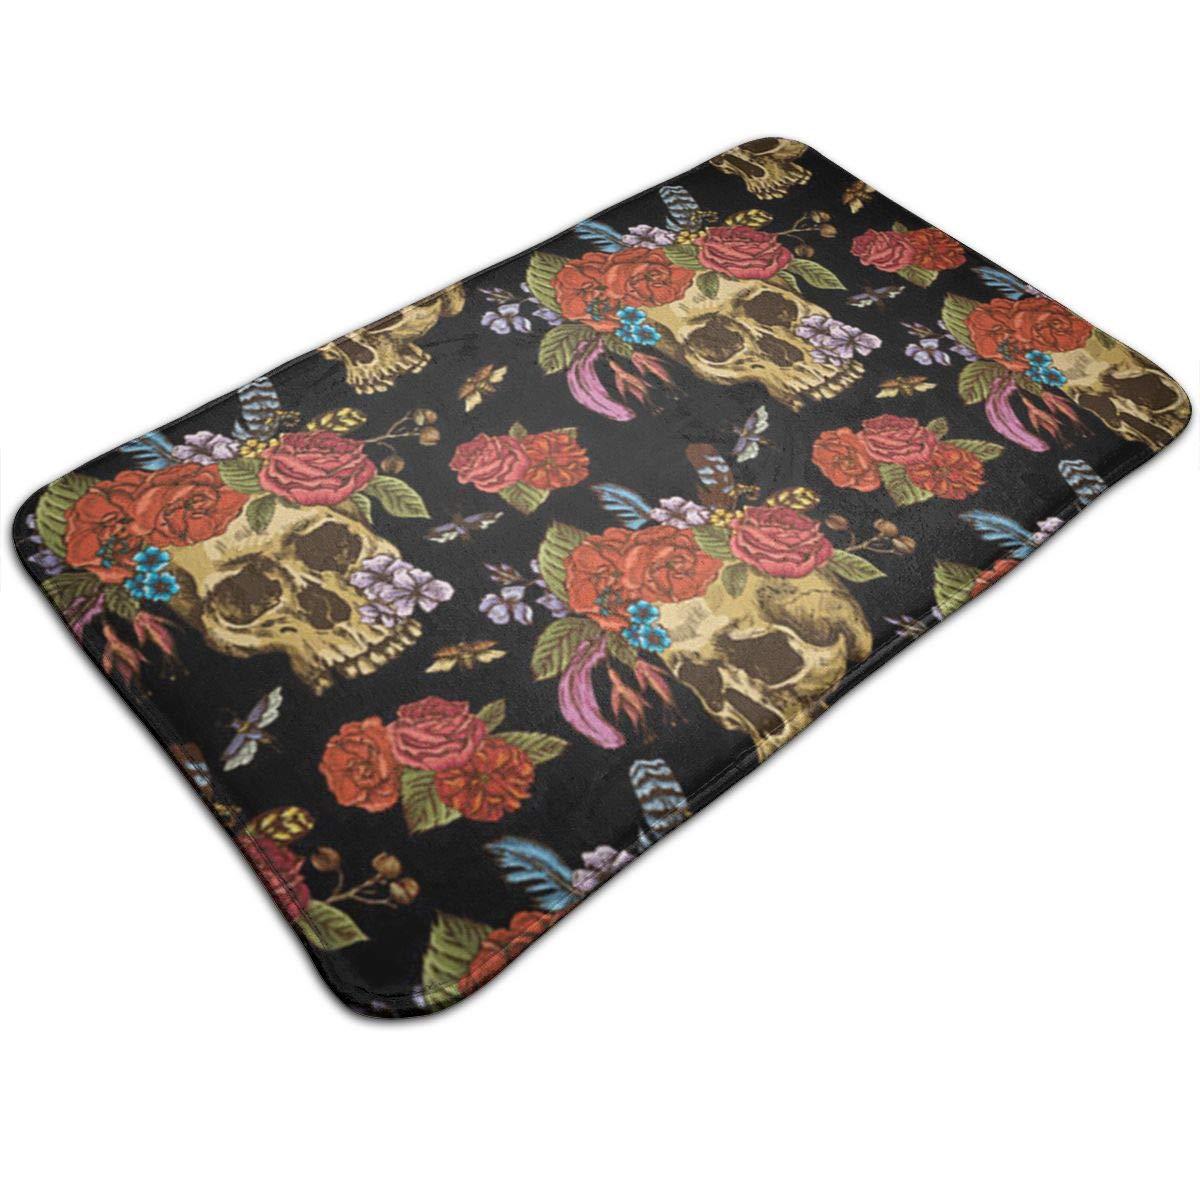 Colorful Sugar Skull with Floral Non Slip Flannel Rug Warm Carpet Bath Door Mat